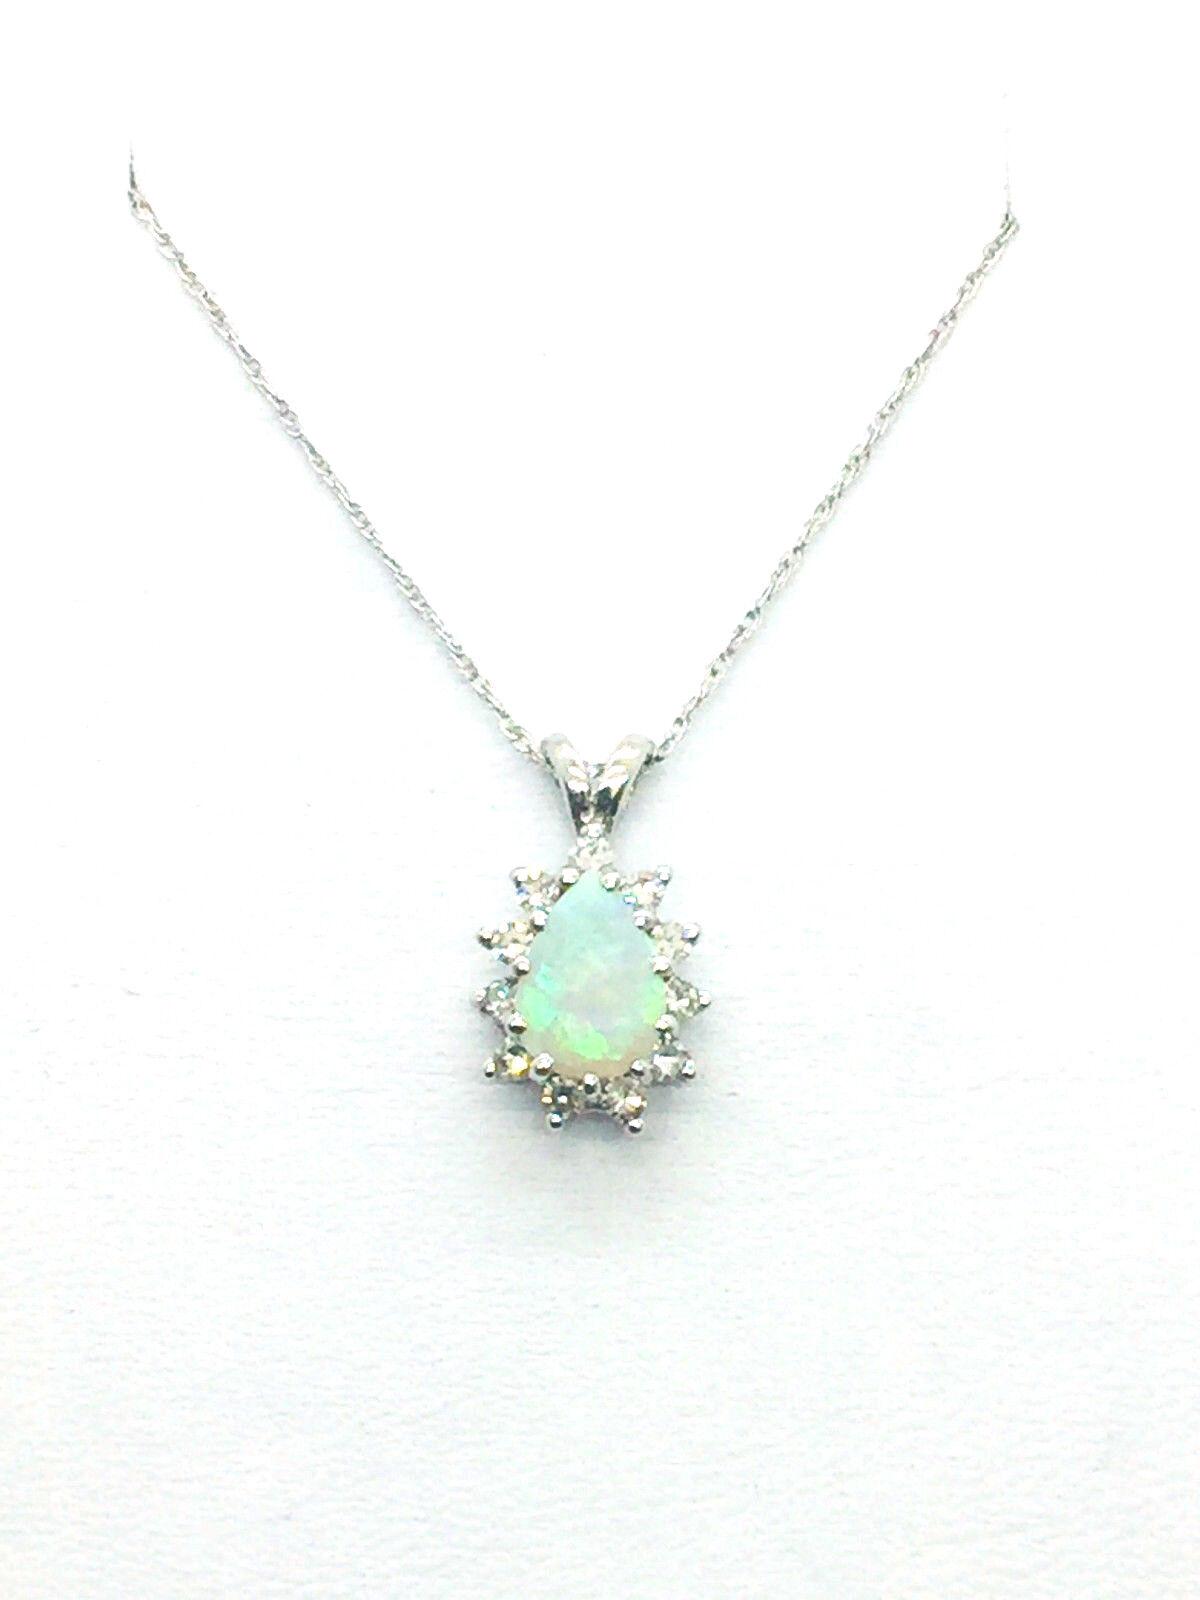 14k Solid White gold Opal & Diamond Pendant & Chain